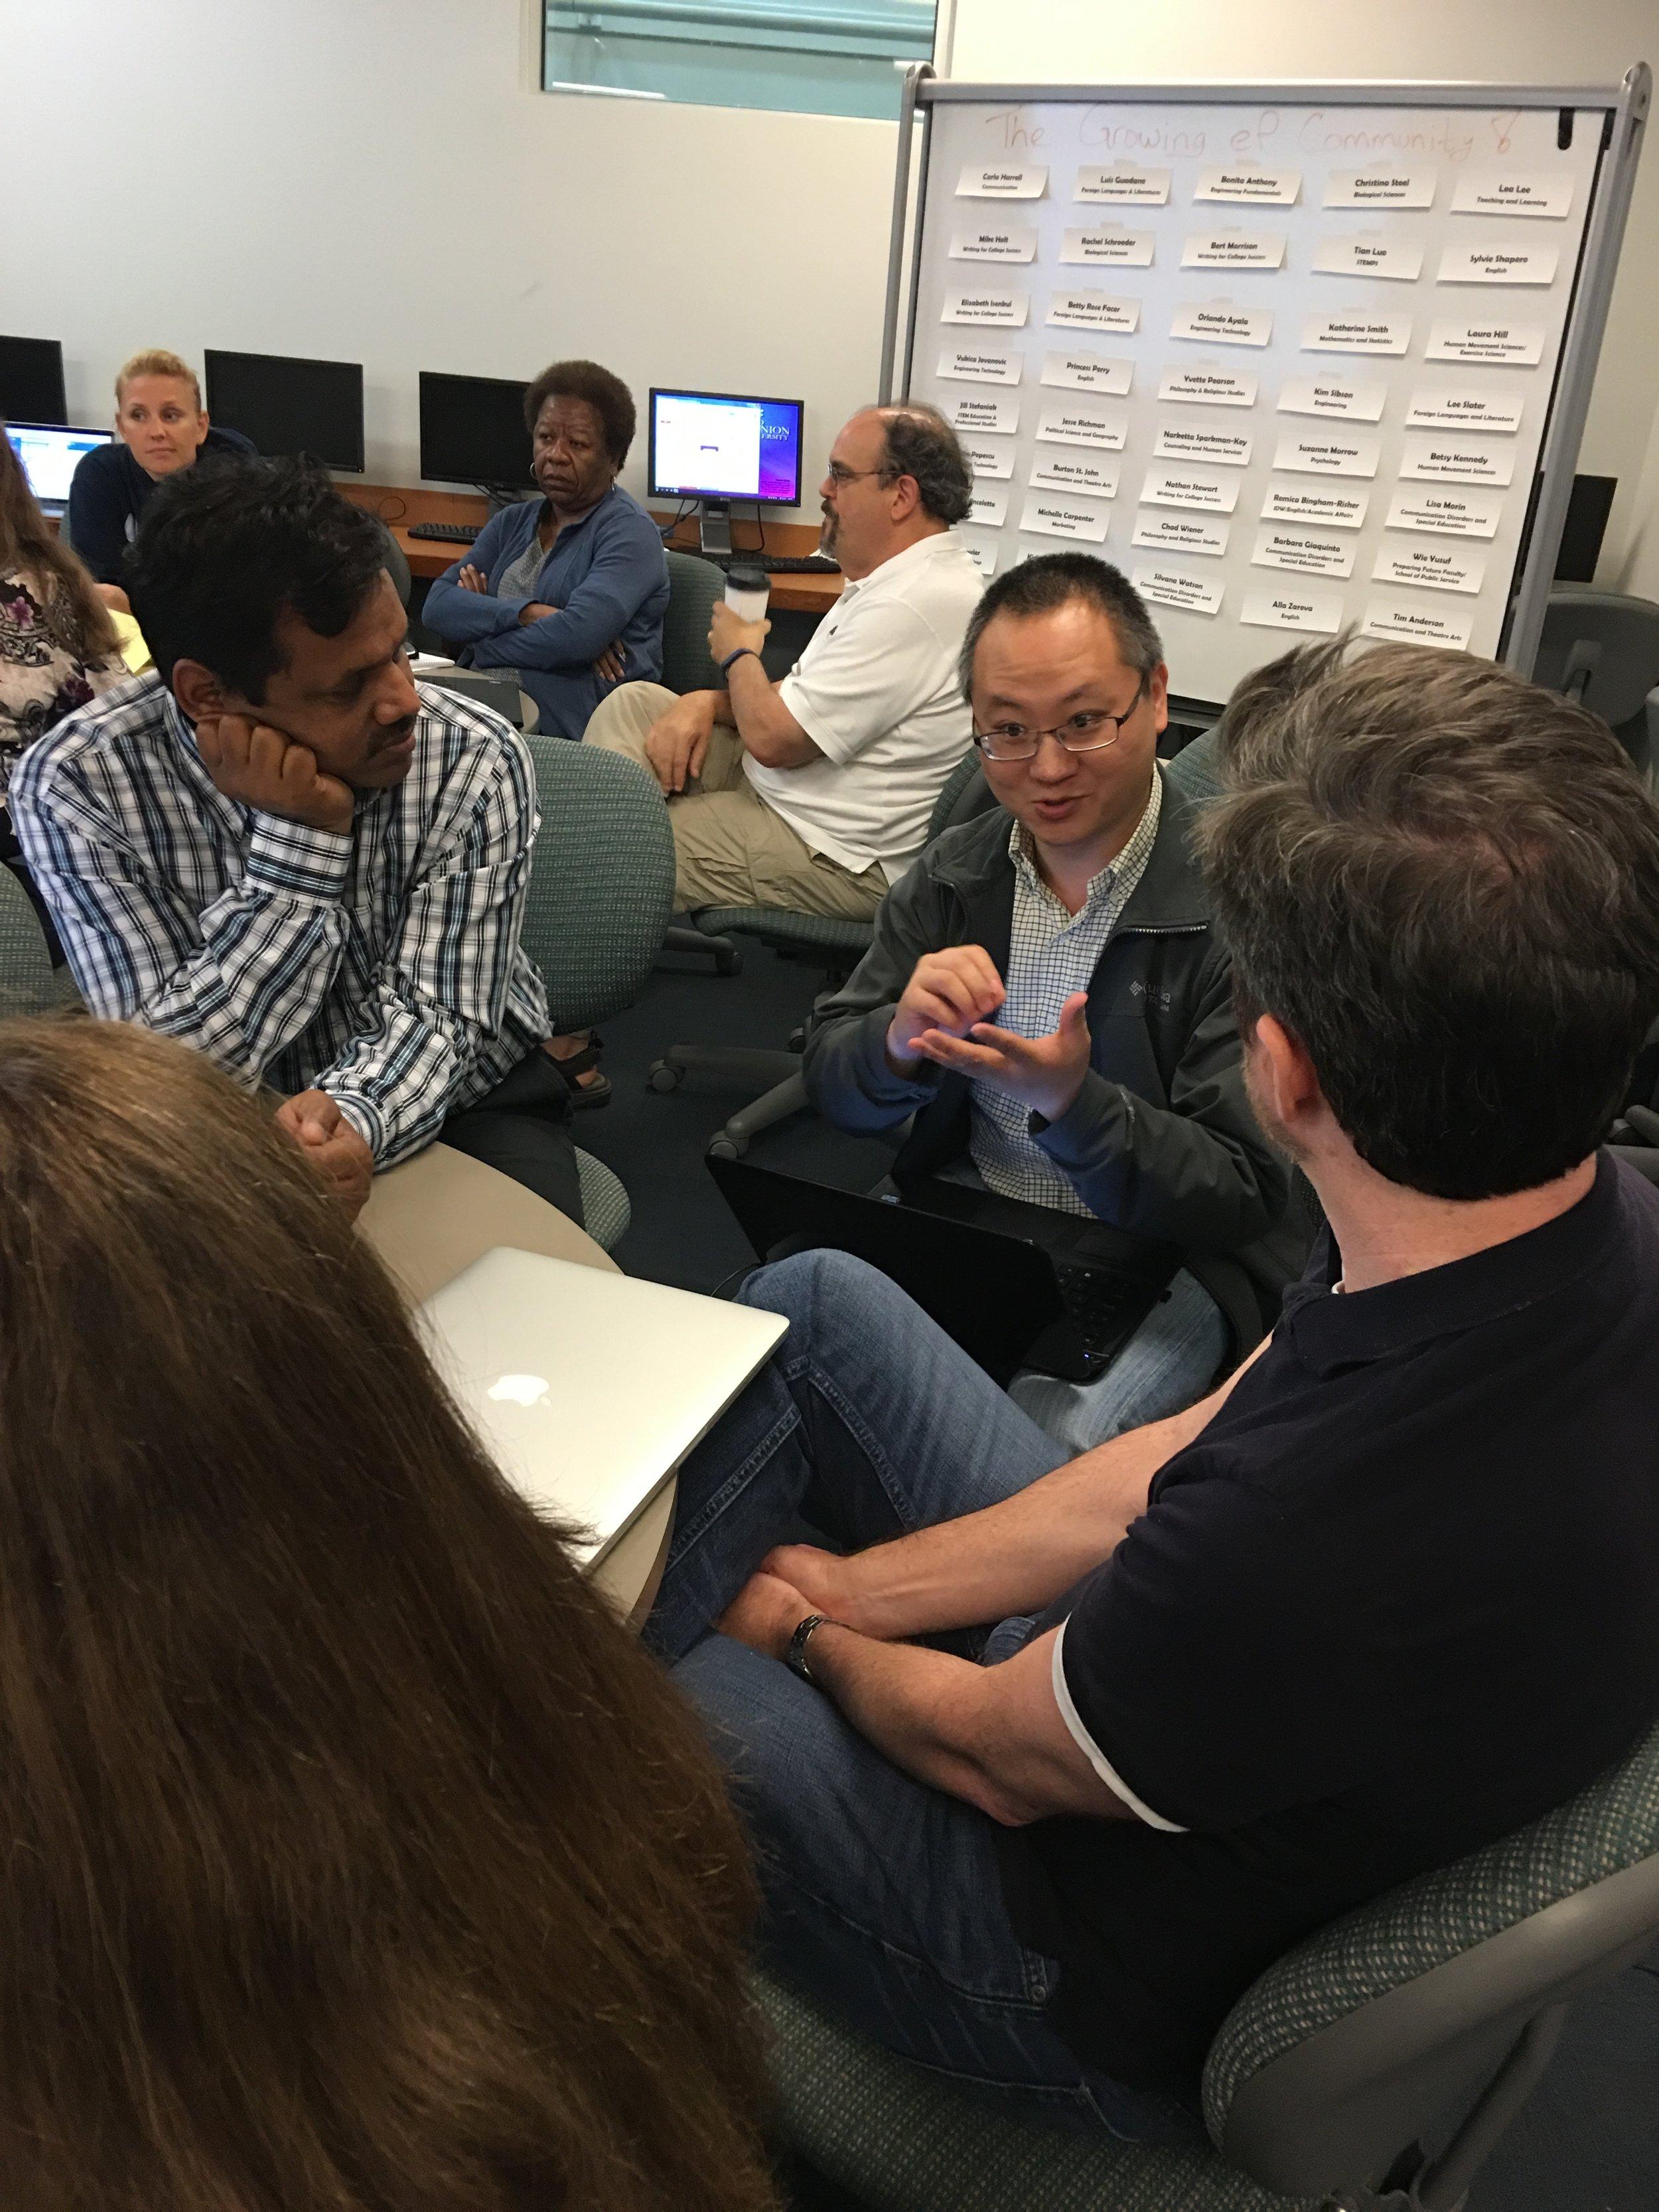 STEM Faculty collaborates on an e-Portfolio activity.